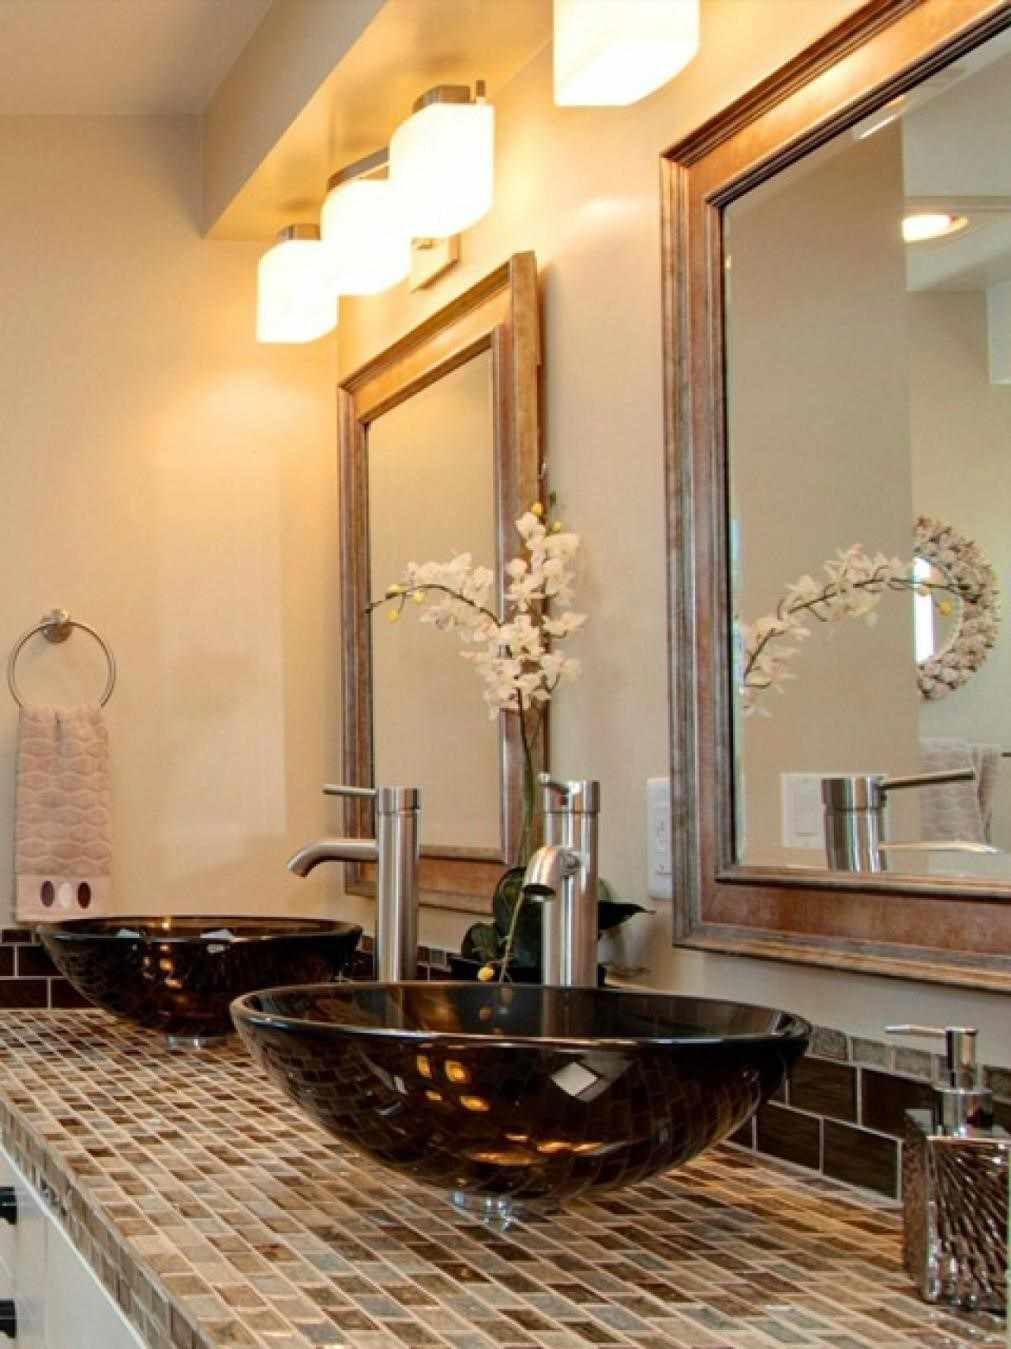 Fancy Kohls Bathroom Accessories Image  Bathroom Design